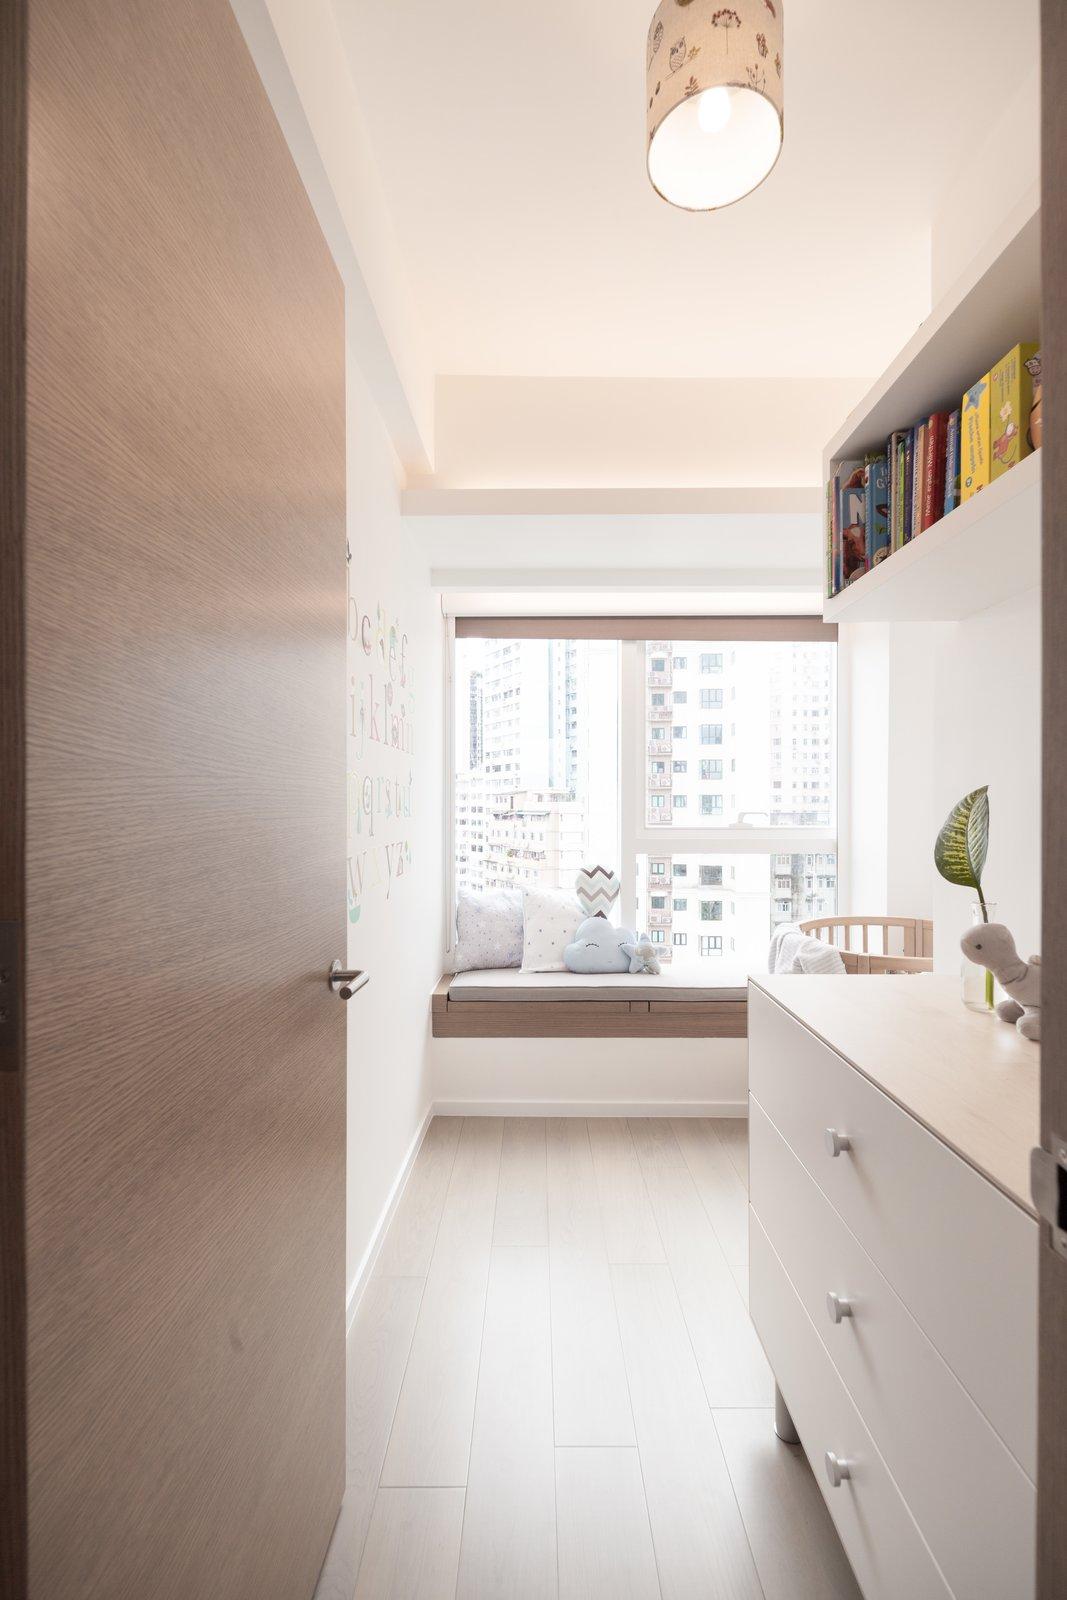 Bedroom http://www.cliftonleungdesignworkshop.com/Cherry+Crest+B  Cherry Crest by Clifton Leung